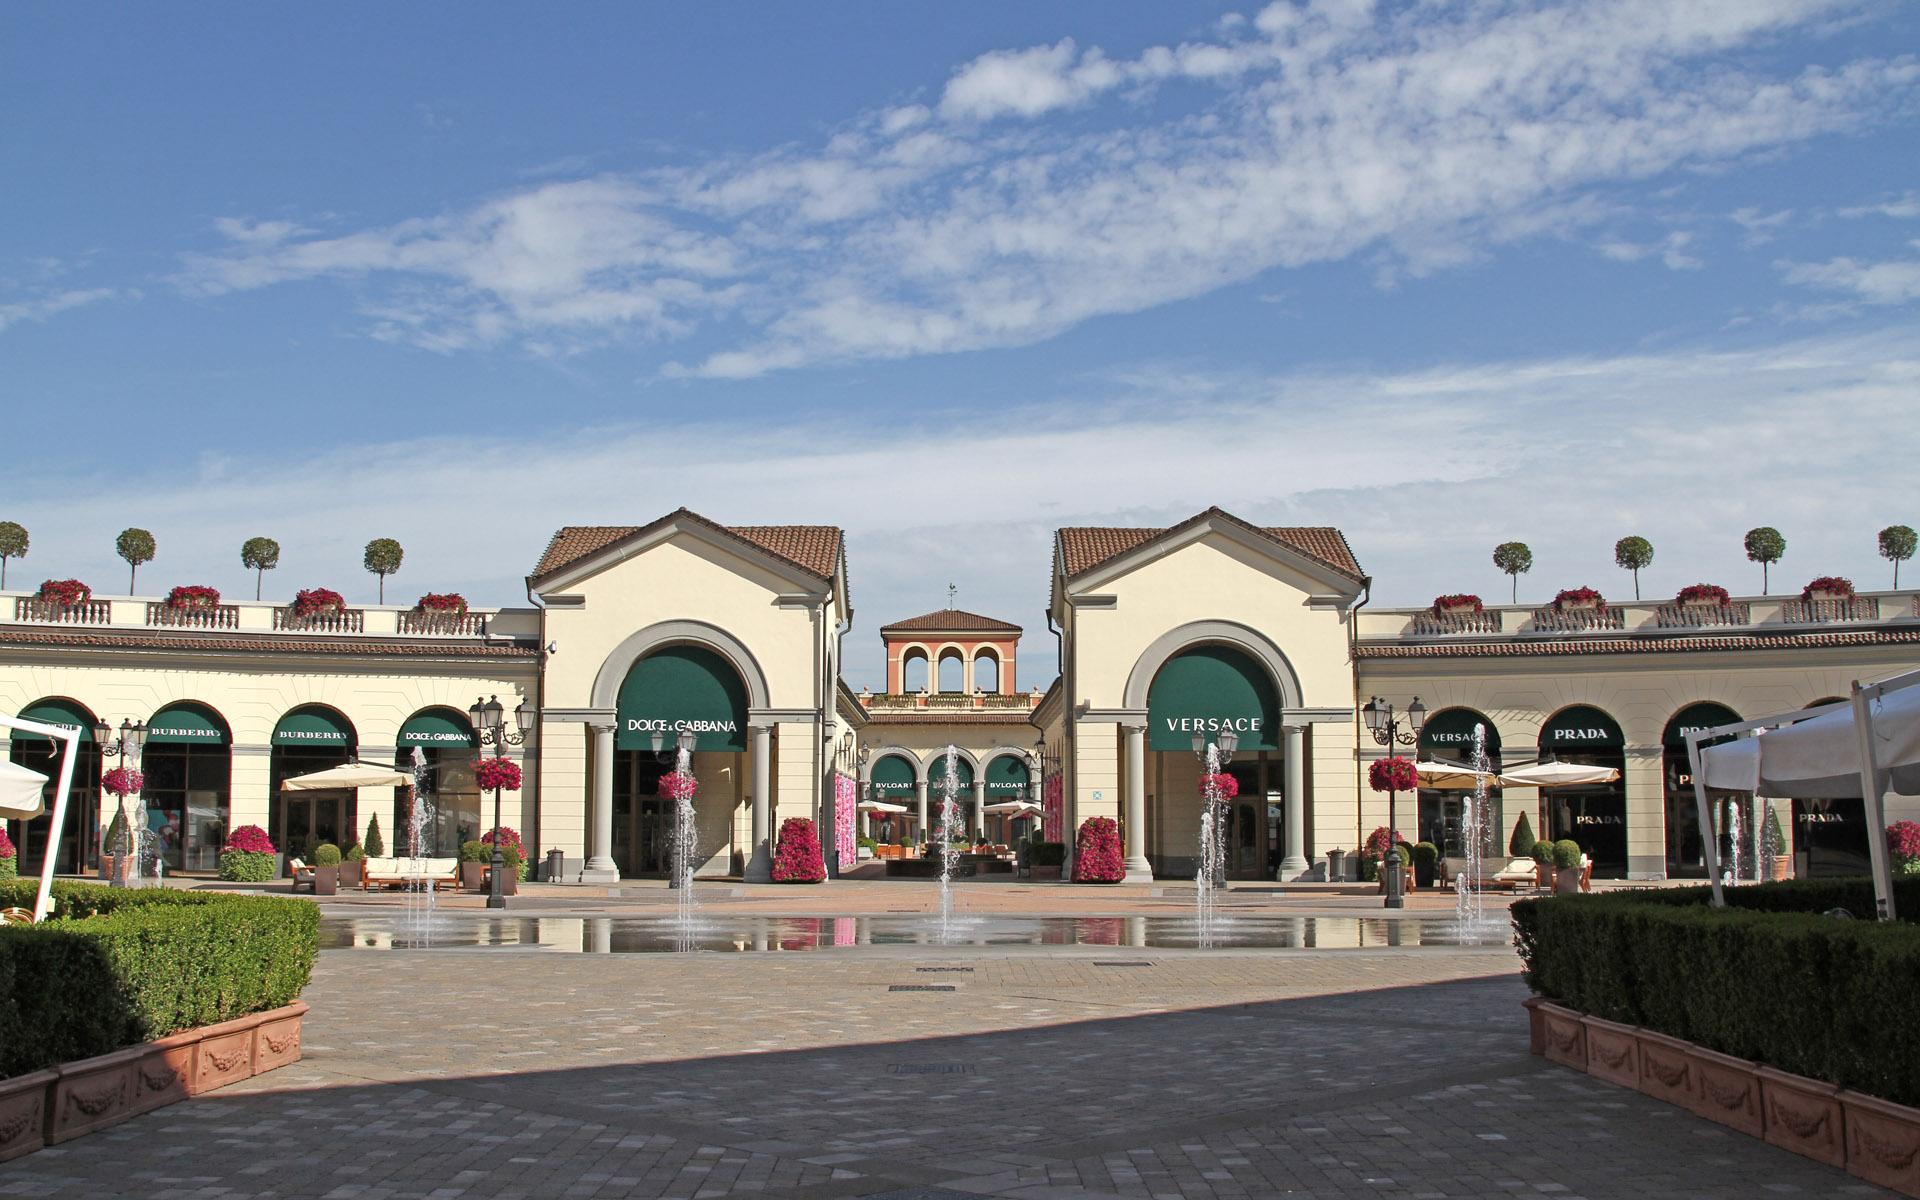 Mcarthur Glen Designer Outlet 15069 Serravalle Scrivia Alessandria ...